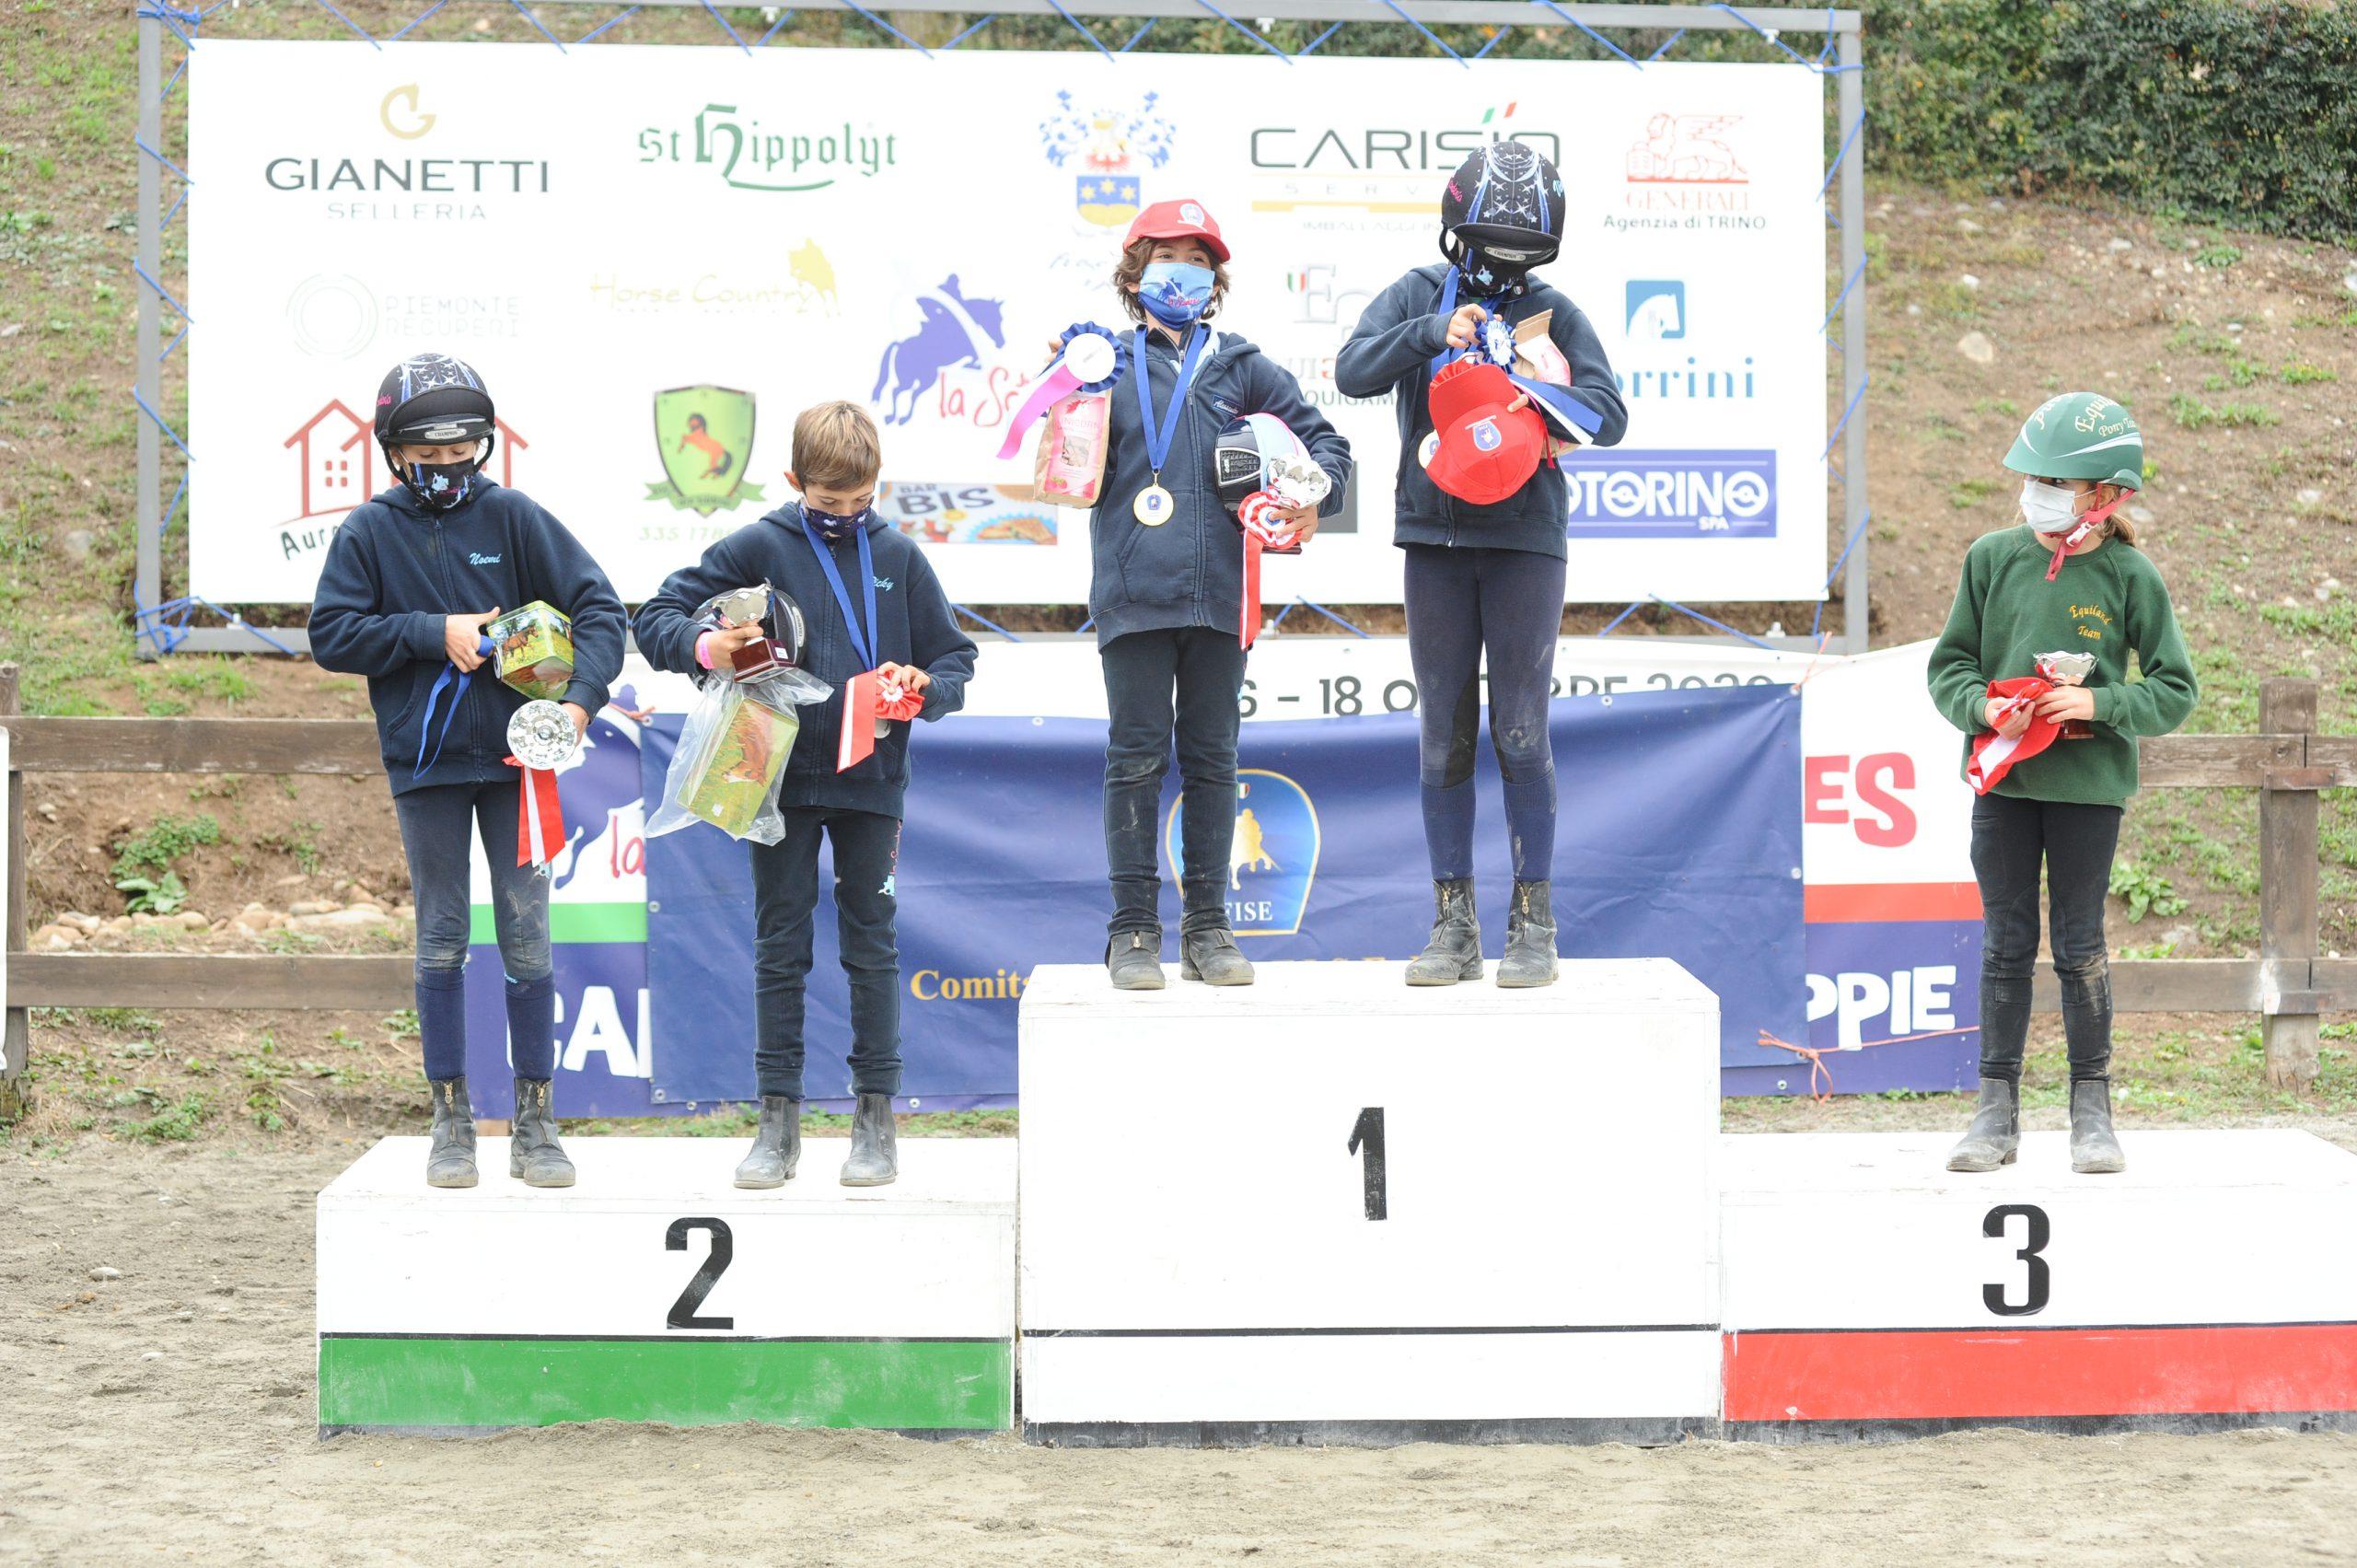 Campionati Piemontesi  – Cavaglià (Bi)  24 – 25 ottobre 2020